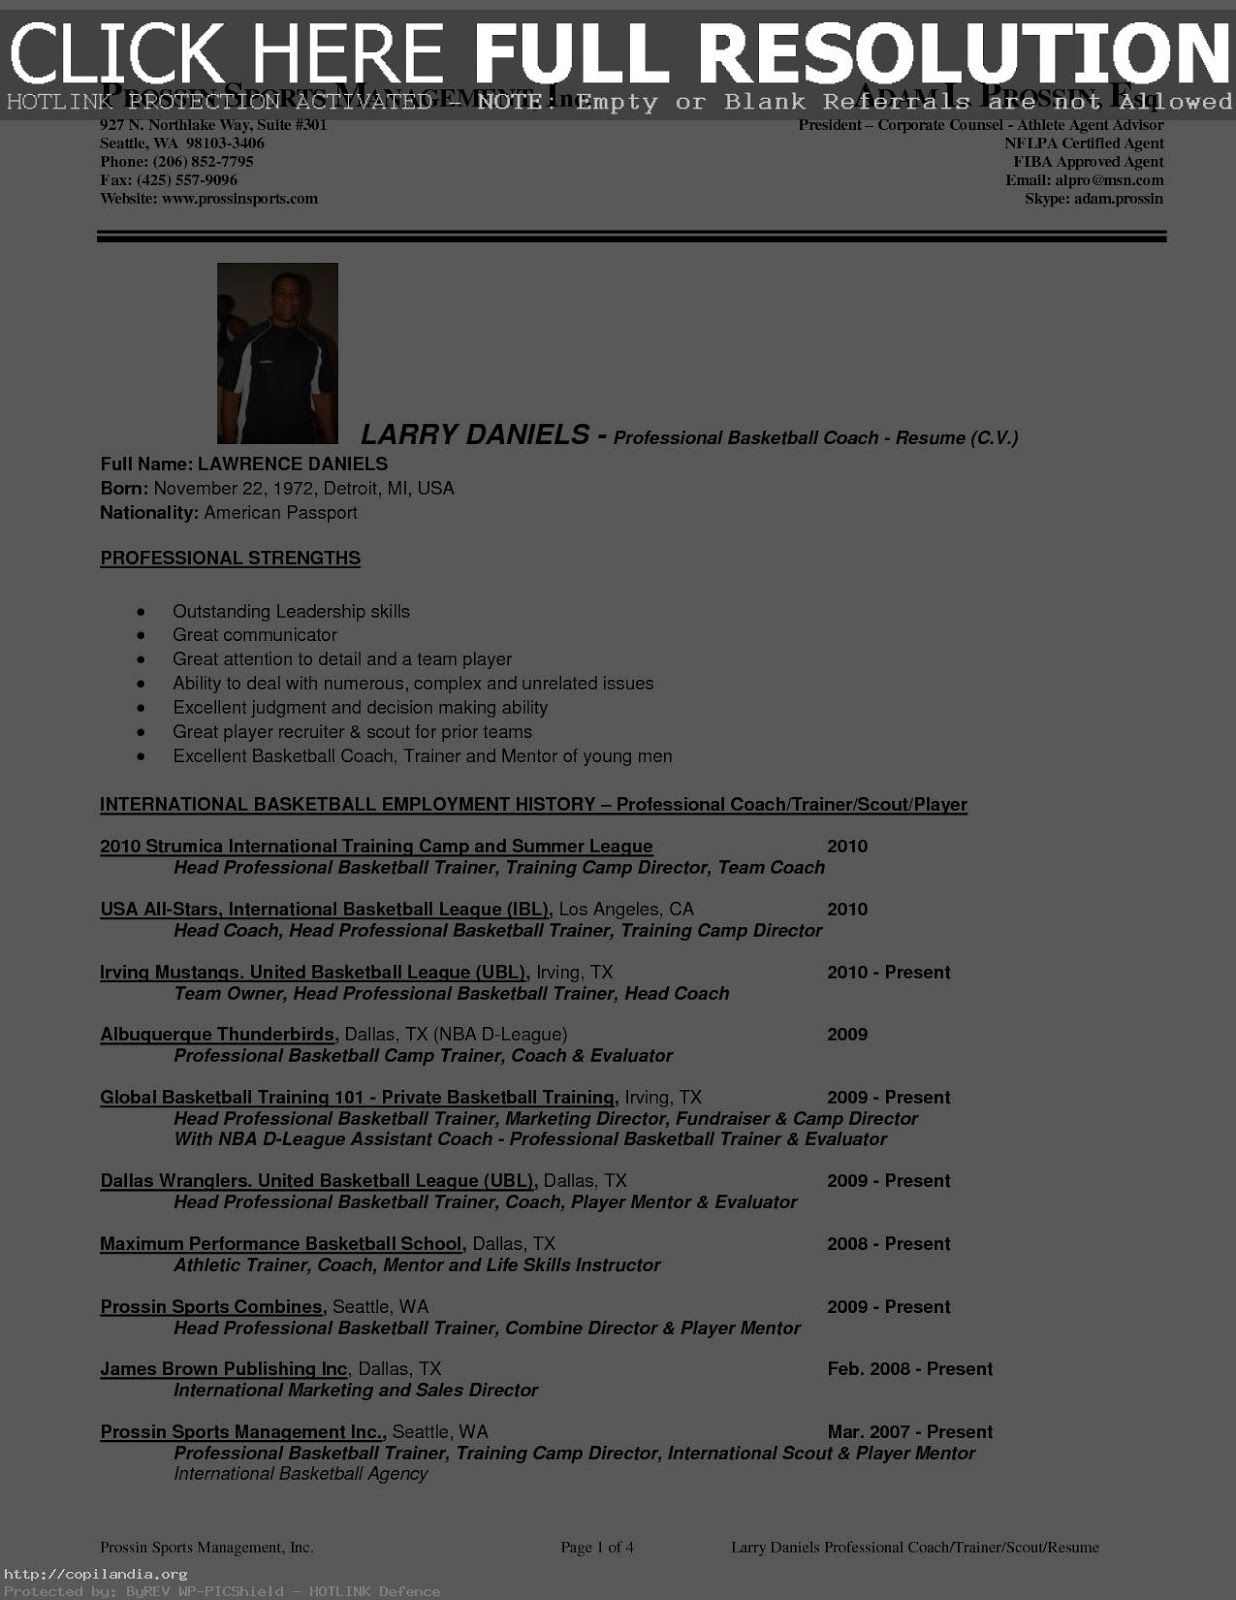 Basketball Player Resume 2019 Professional Basketball Player Resume Templates 2020 Basketball Player Resume Examples Resume Basketball Players Resume Templates